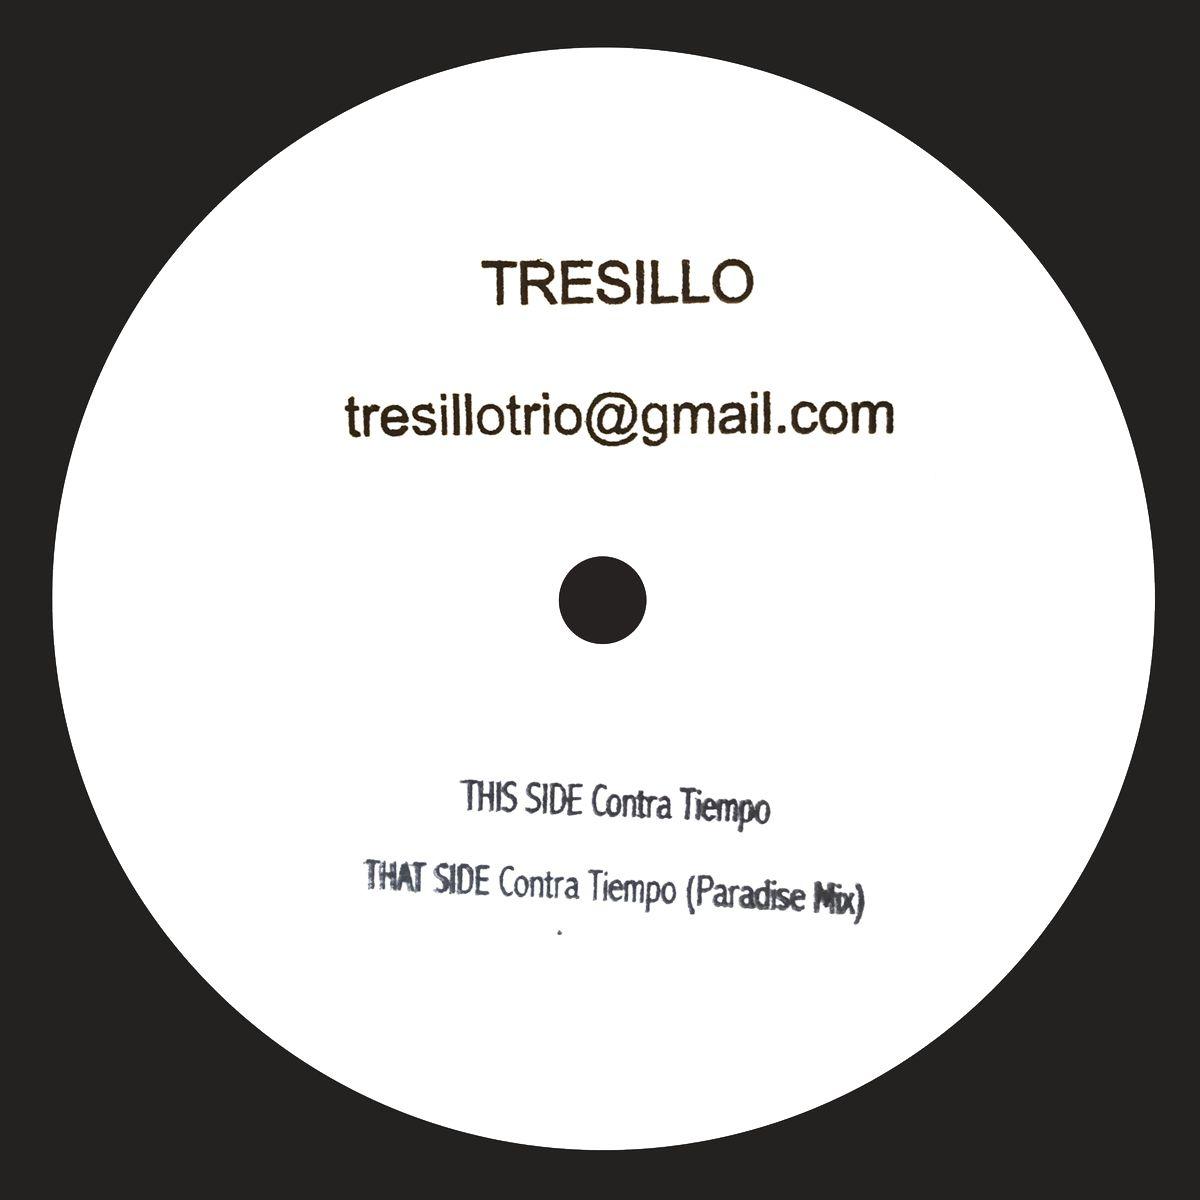 tresillo1_artworkv2.jpg